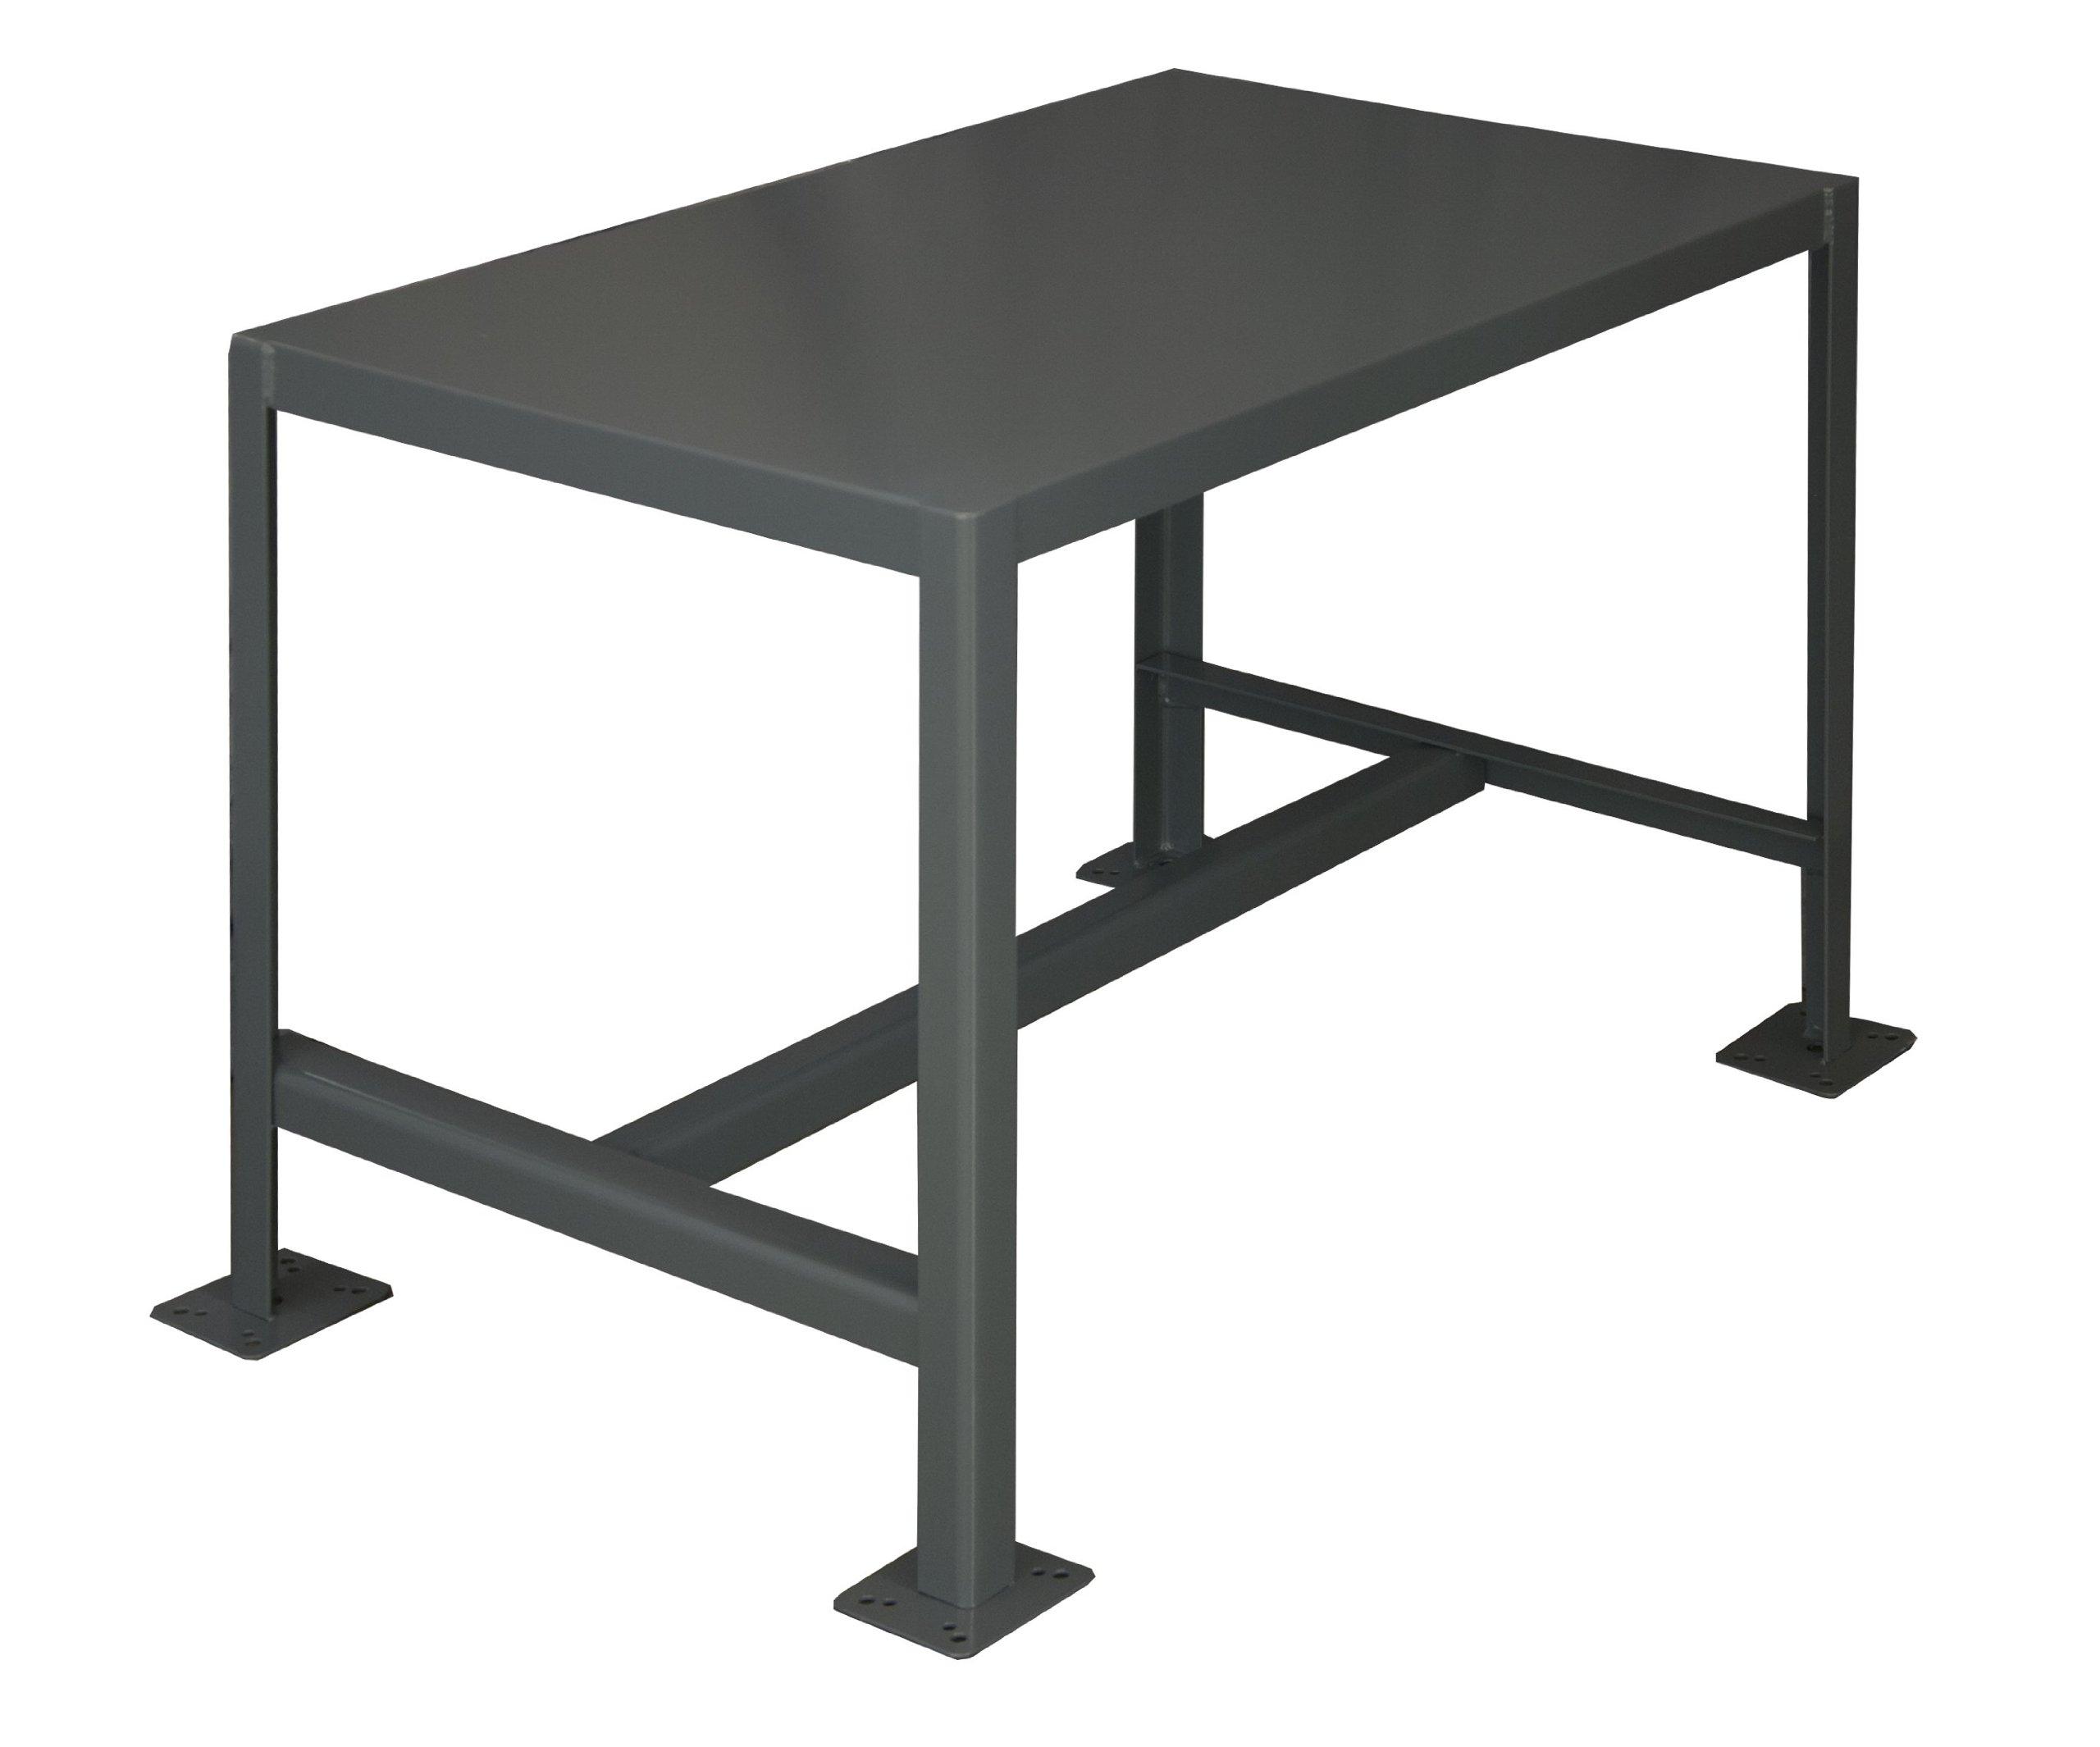 Durham Steel Medium Duty Machine Table, MT182436-2K195,  1 Shelves,  2000 lbs Capacity,  24'' Length x 18'' Width x 36'' Height